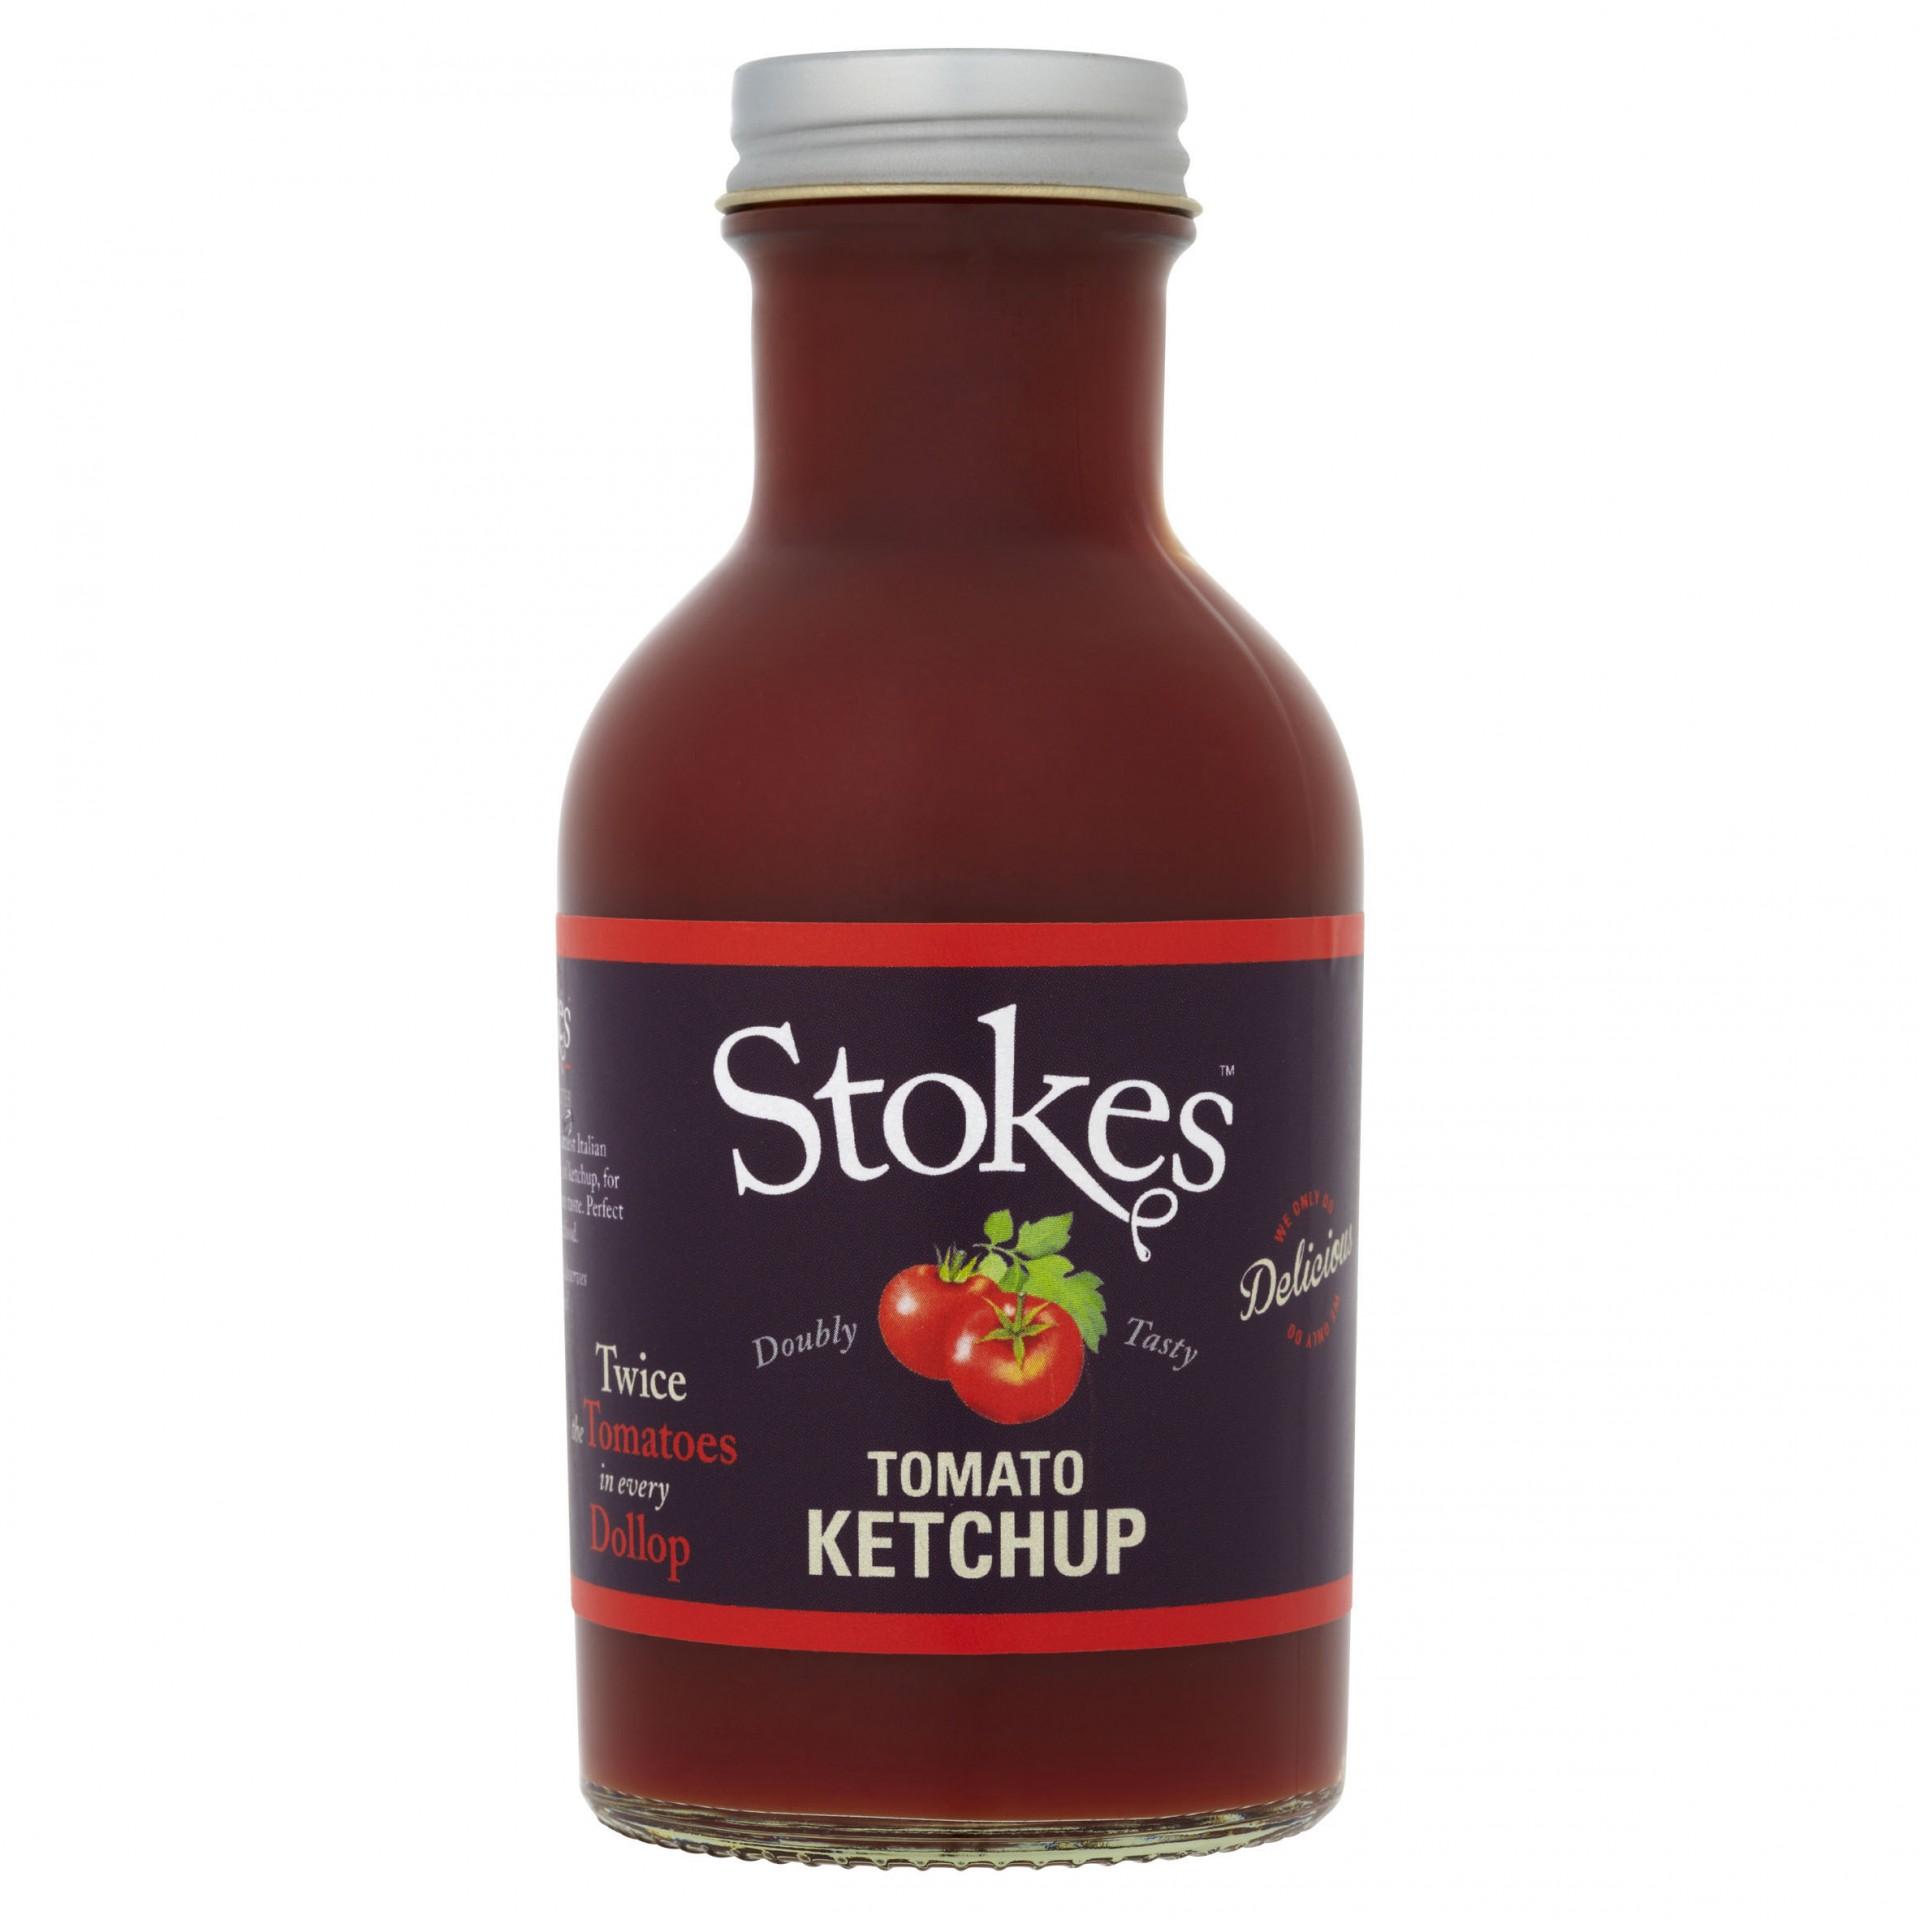 STOKES Tomato Ketchup (Glass)